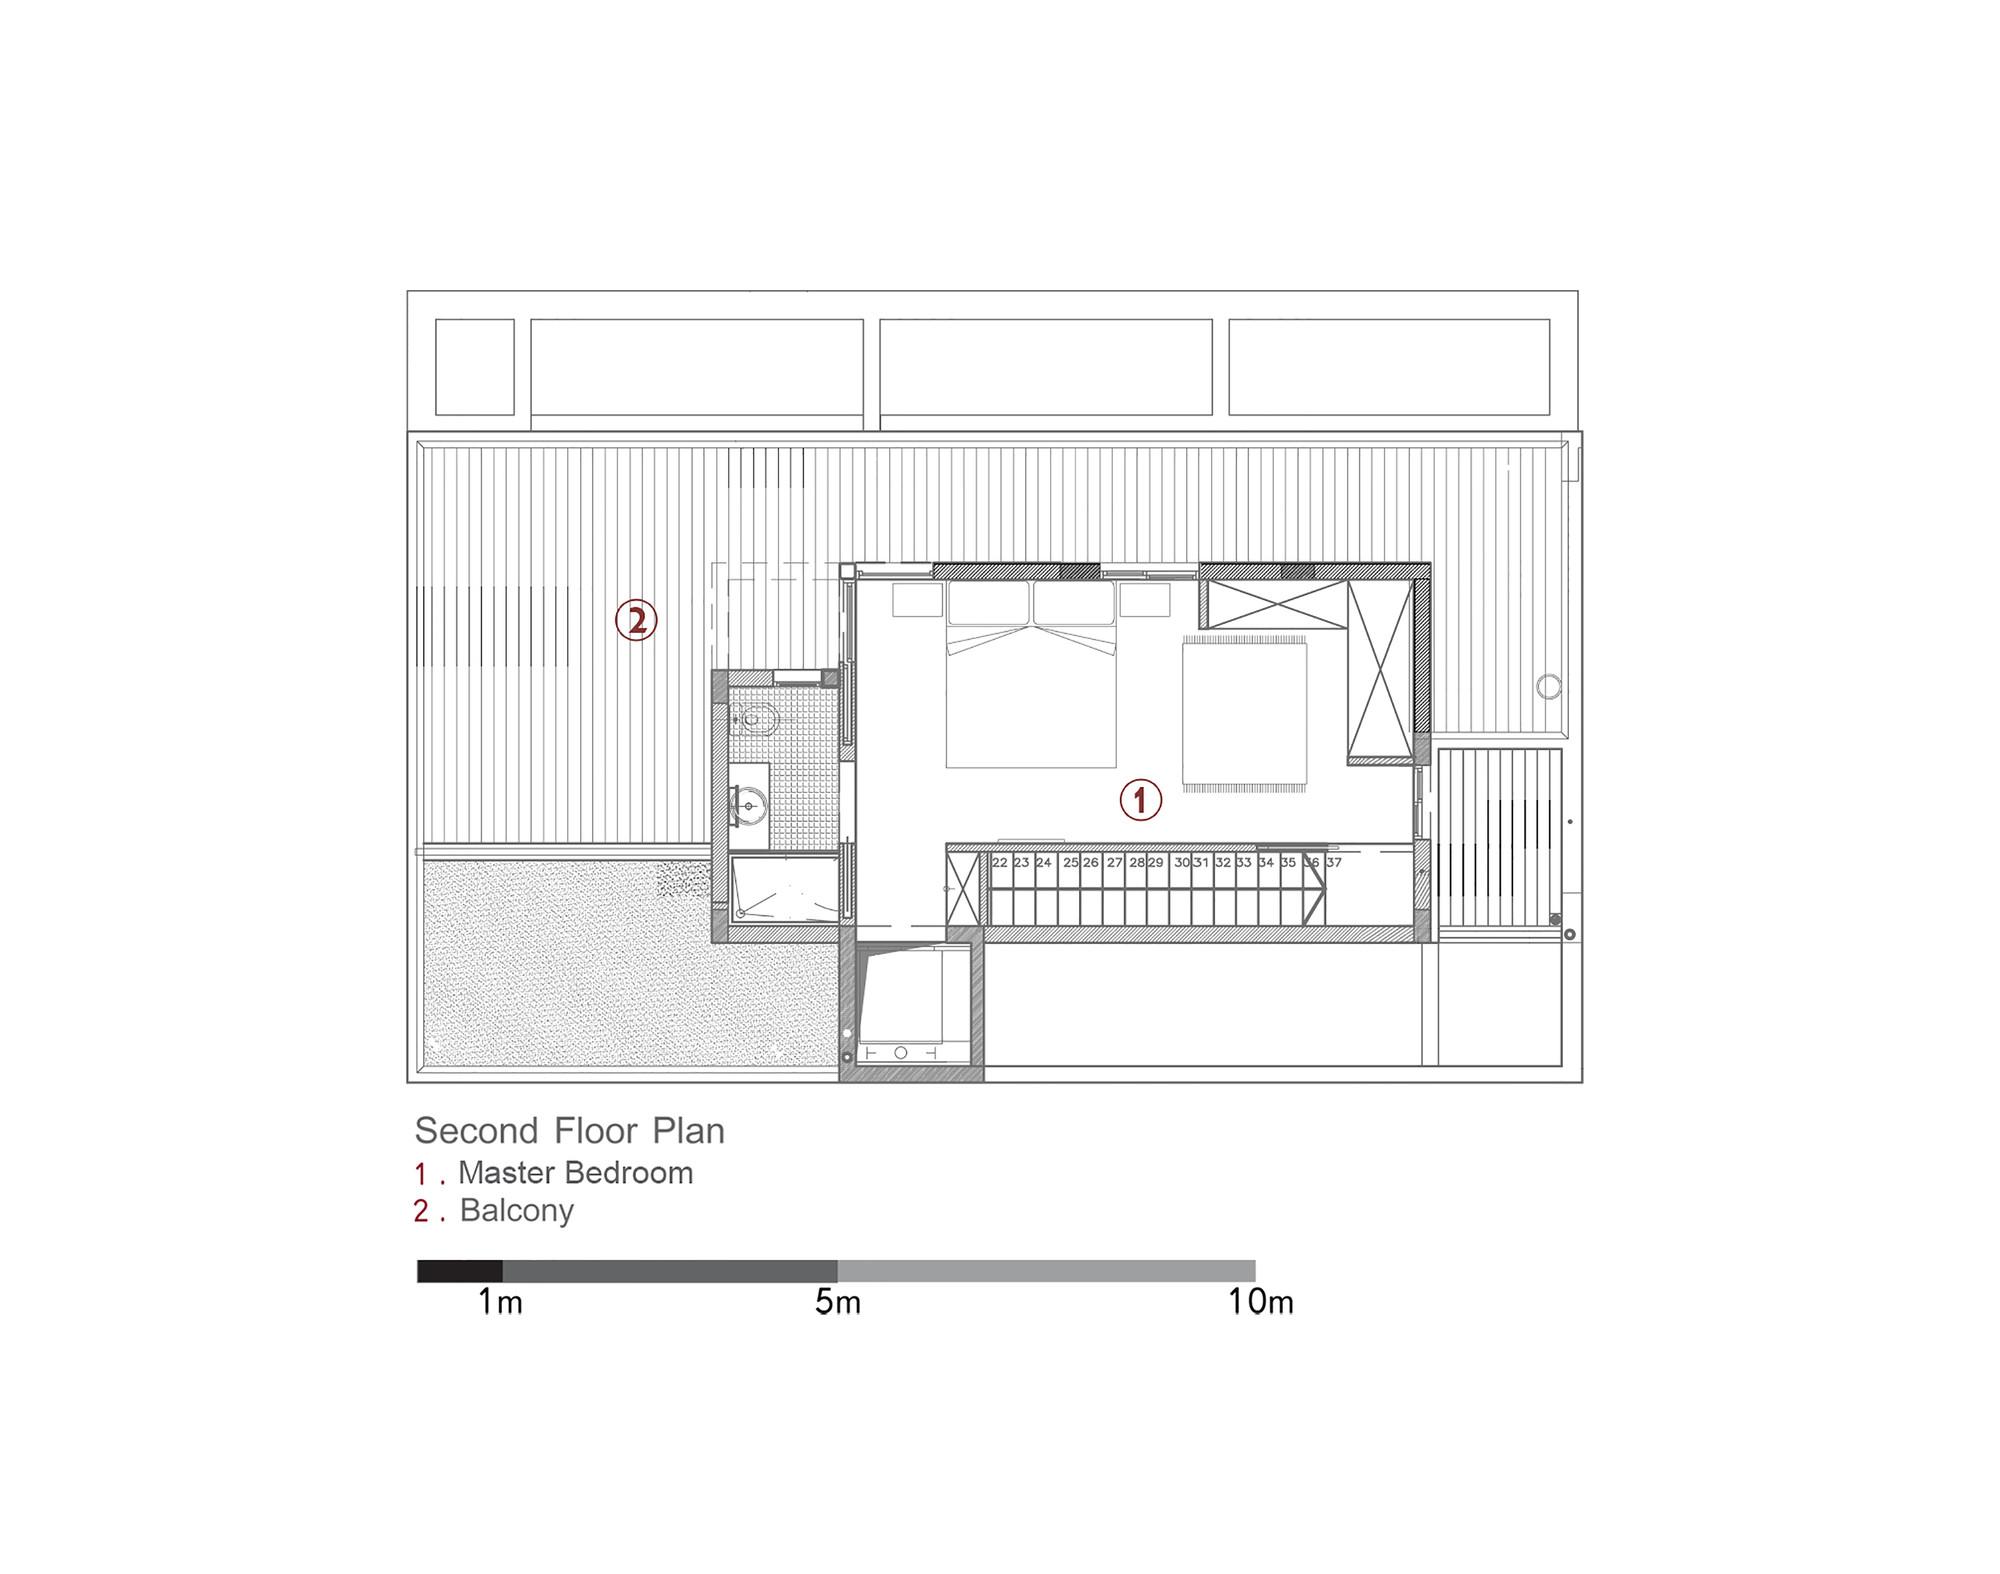 D House,Second Floor Plan